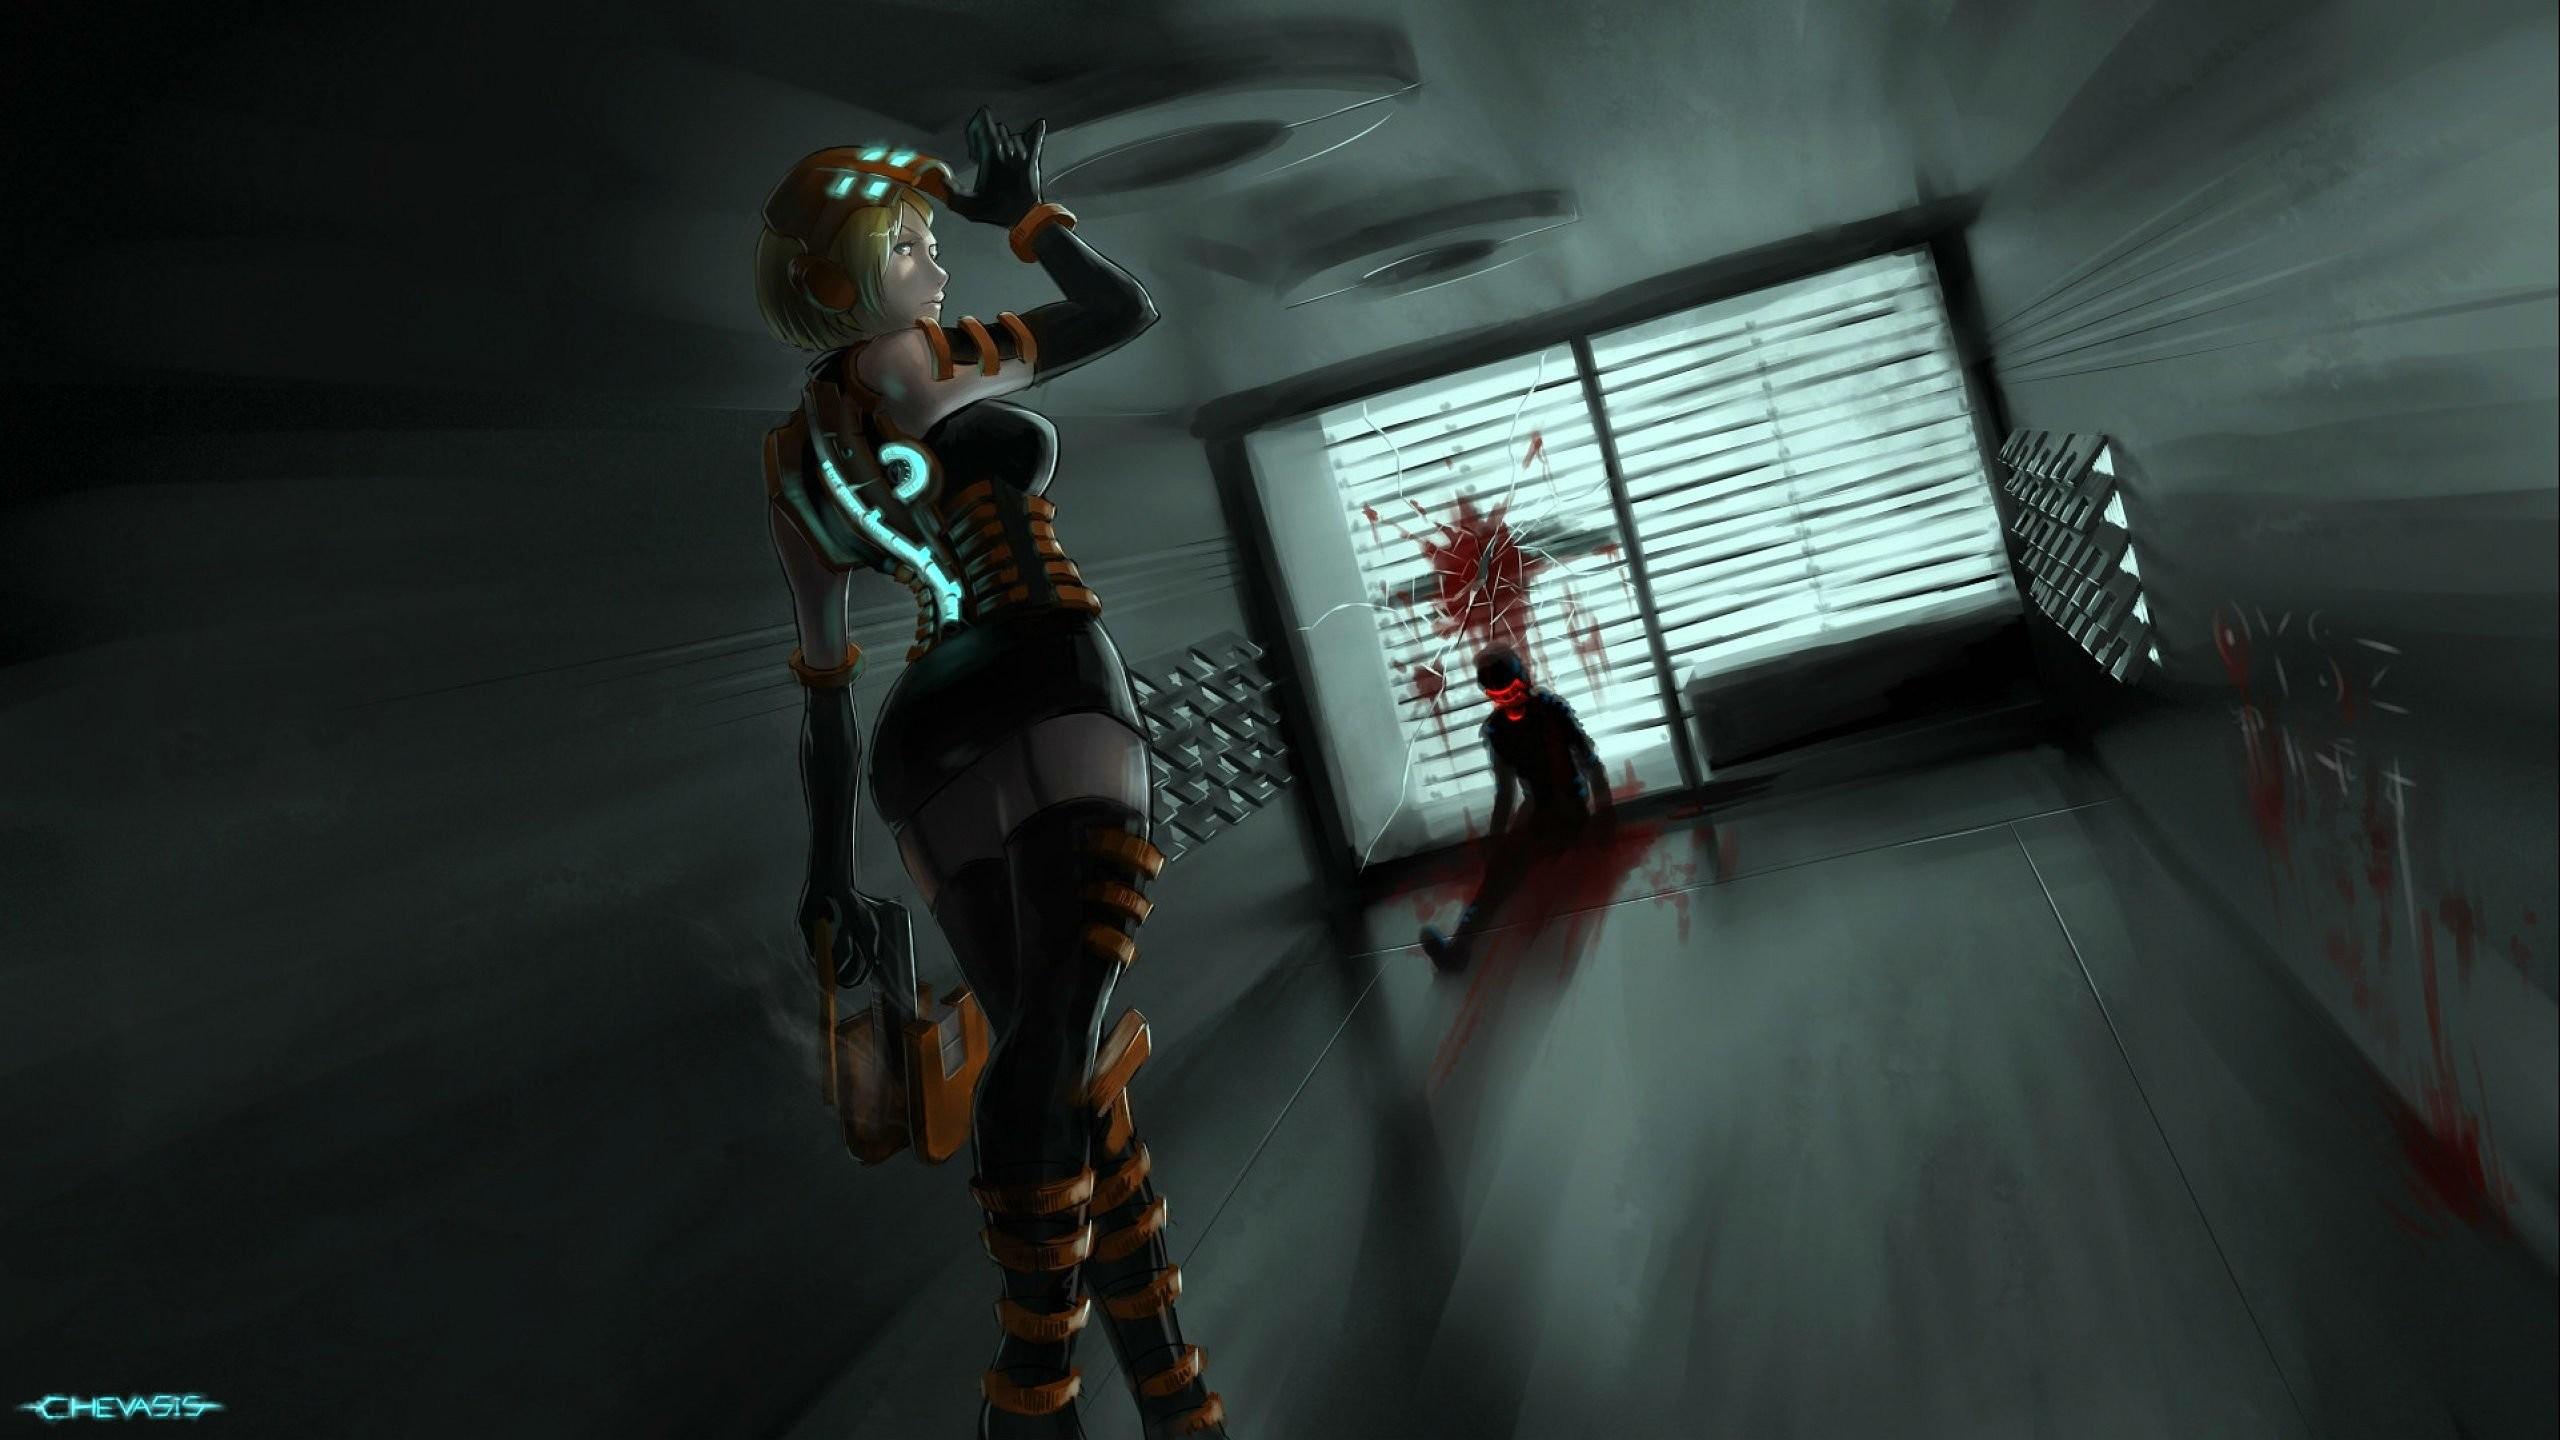 DEAD SPACE sci-fi shooter action futuristic 1deads warrior cyborg robot alien  aliens artwork deadspace fighting wallpaper     740426    WallpaperUP